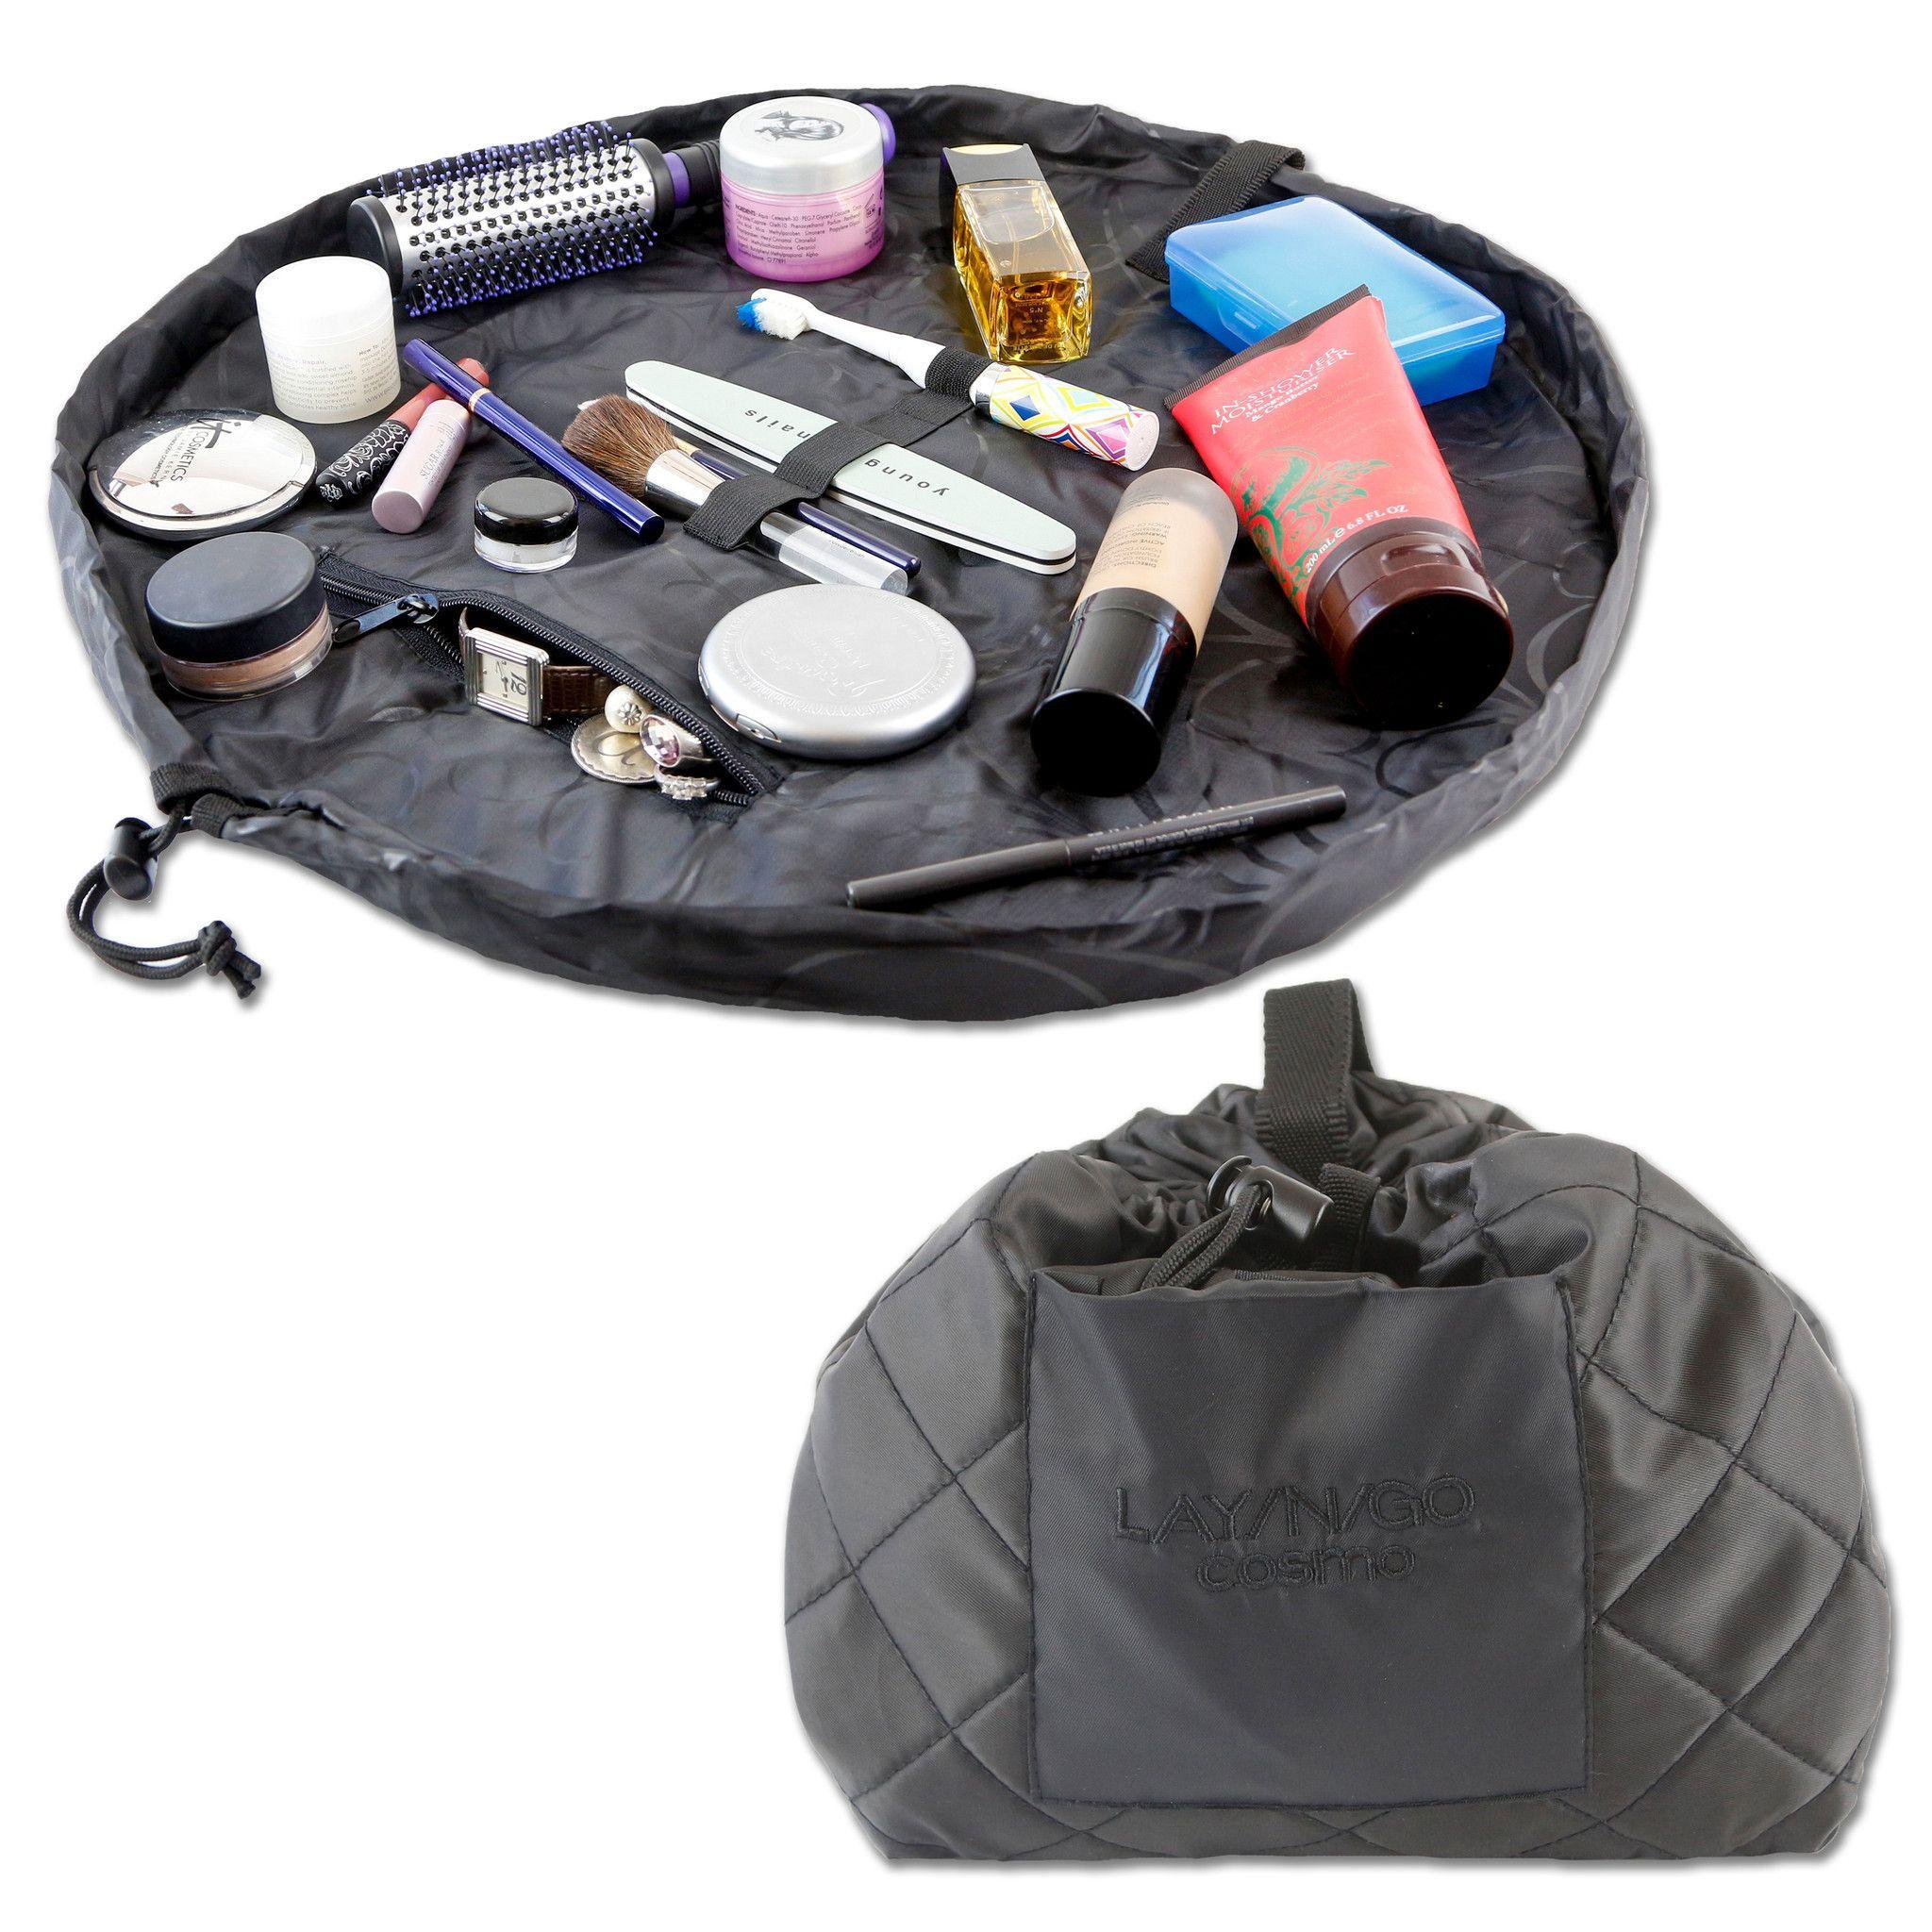 "LaynGo COSMO Deluxe (22"") Black Cosmetic bag, Bags"